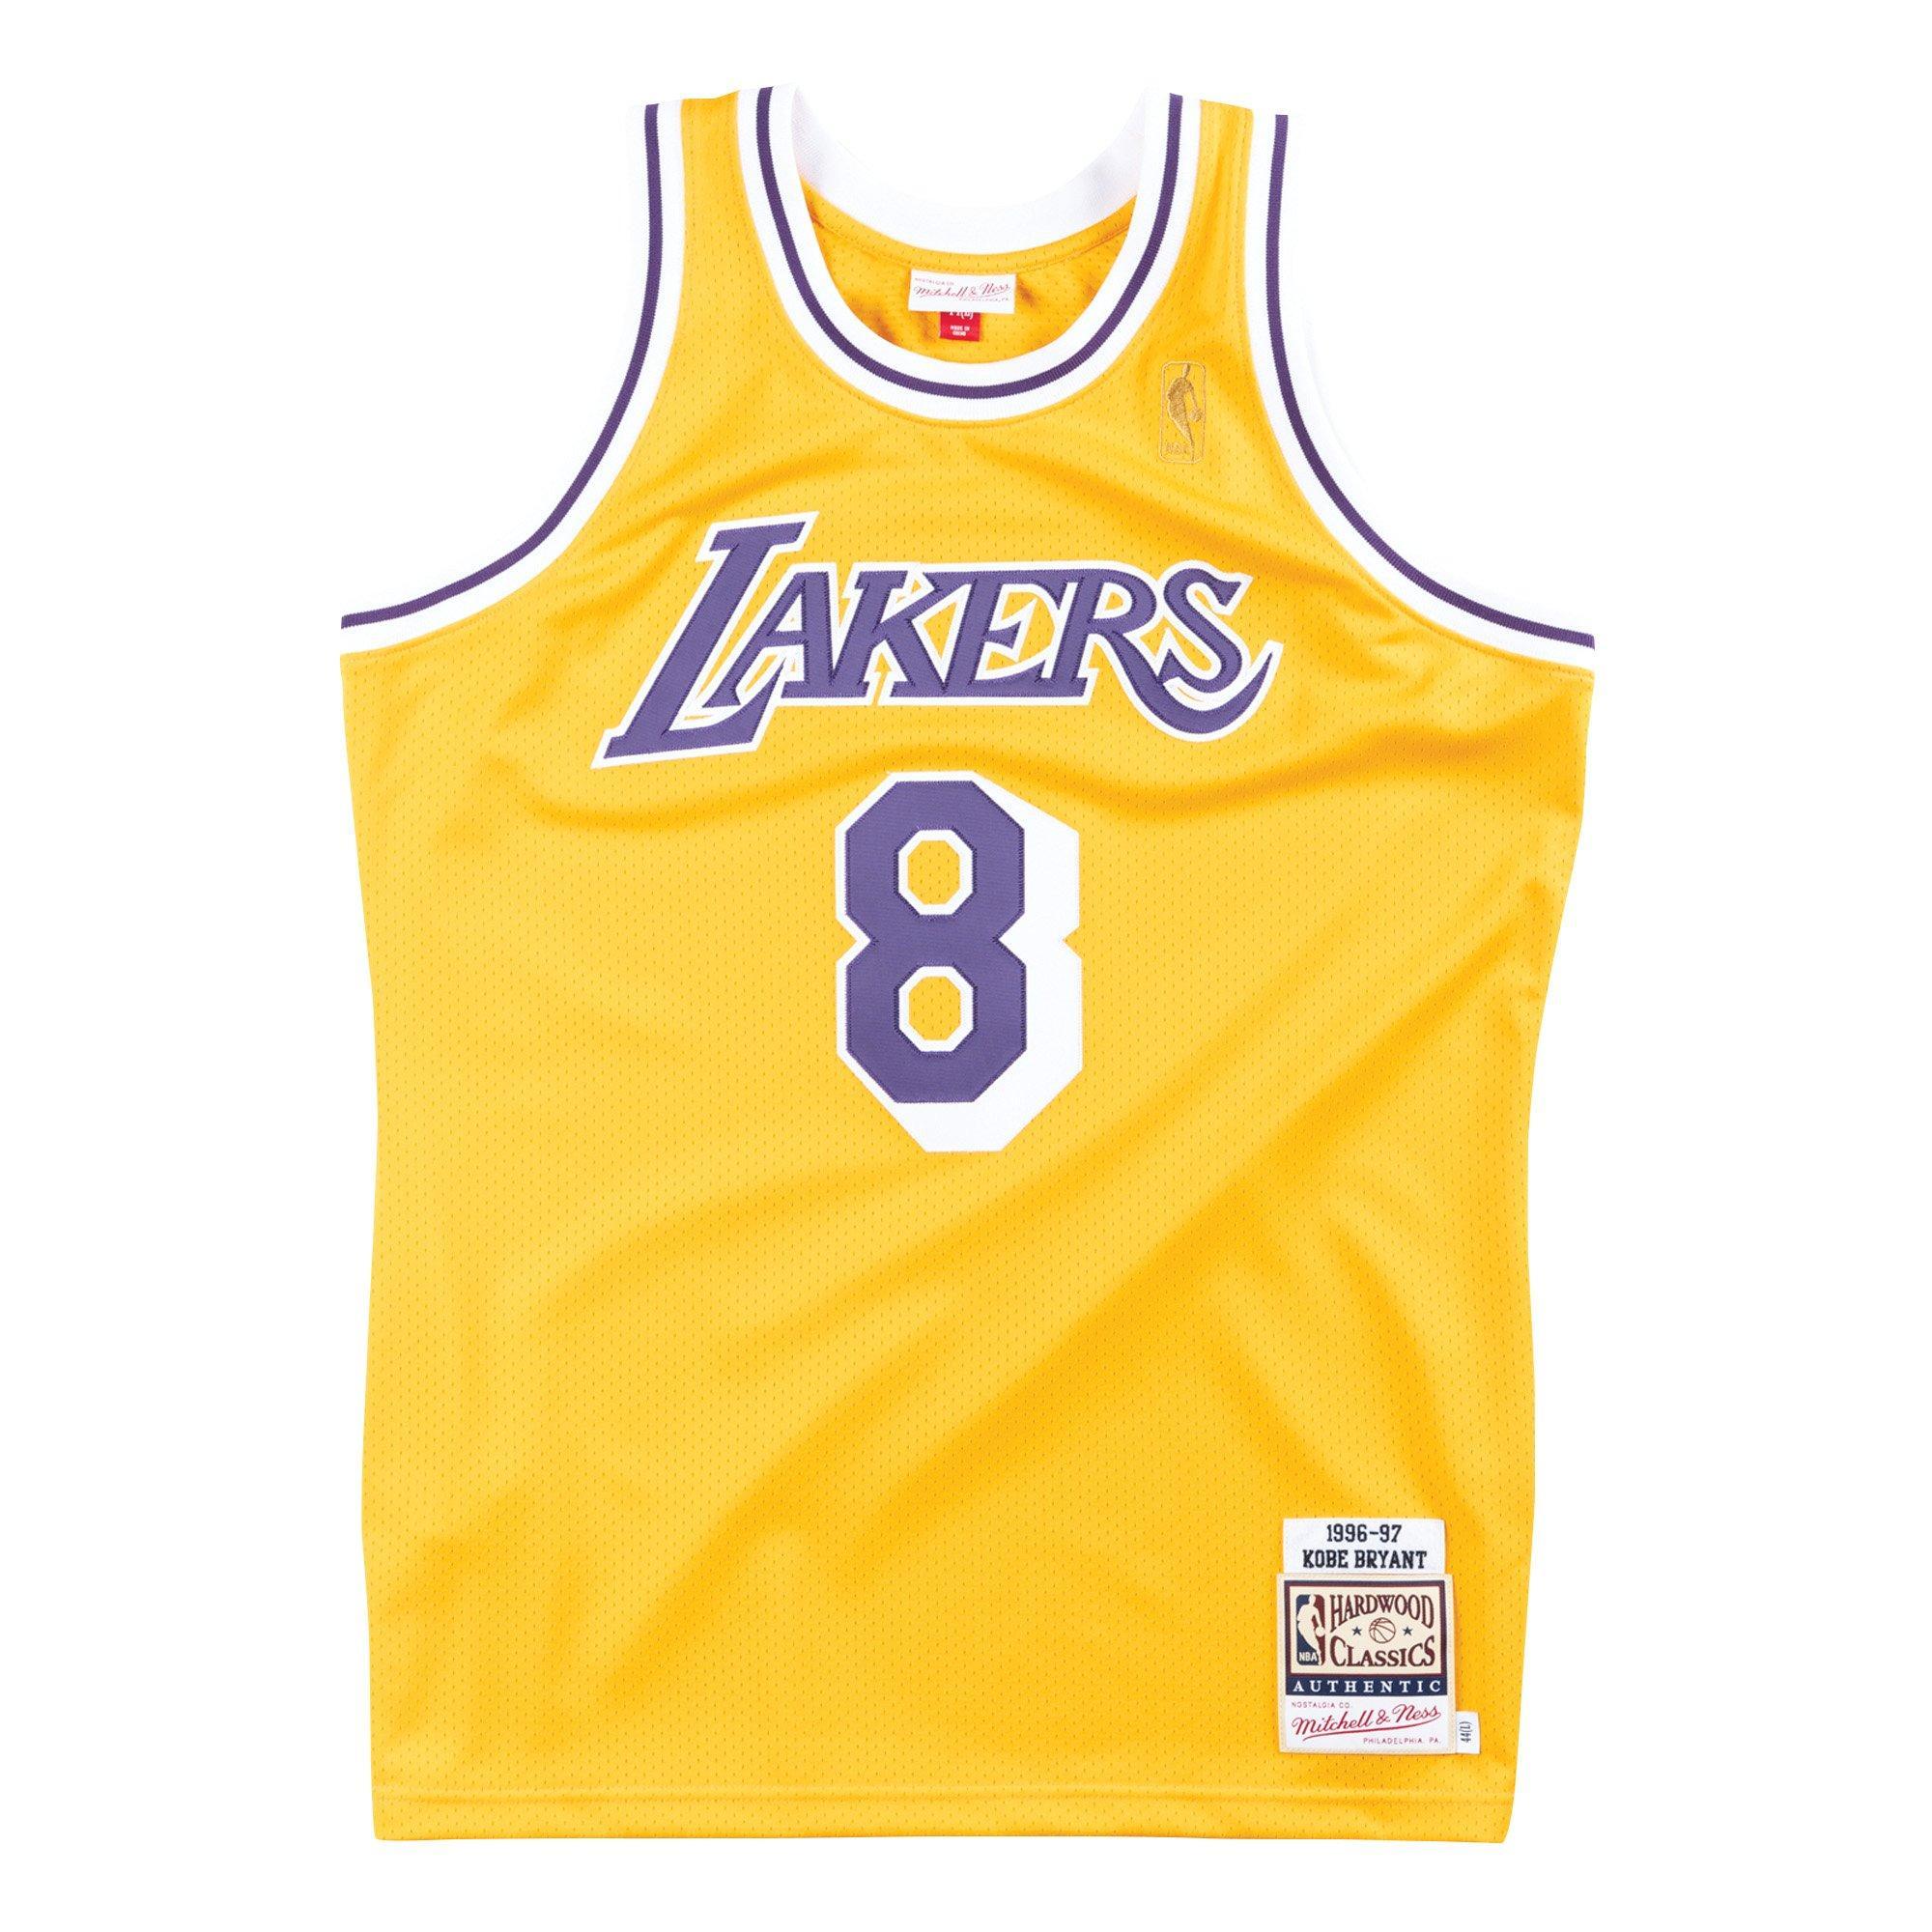 Mitchell & Ness Men's Los Angeles Lakers Kobe Bryant '96-'97 Hardwood Classics Authentic Jersey